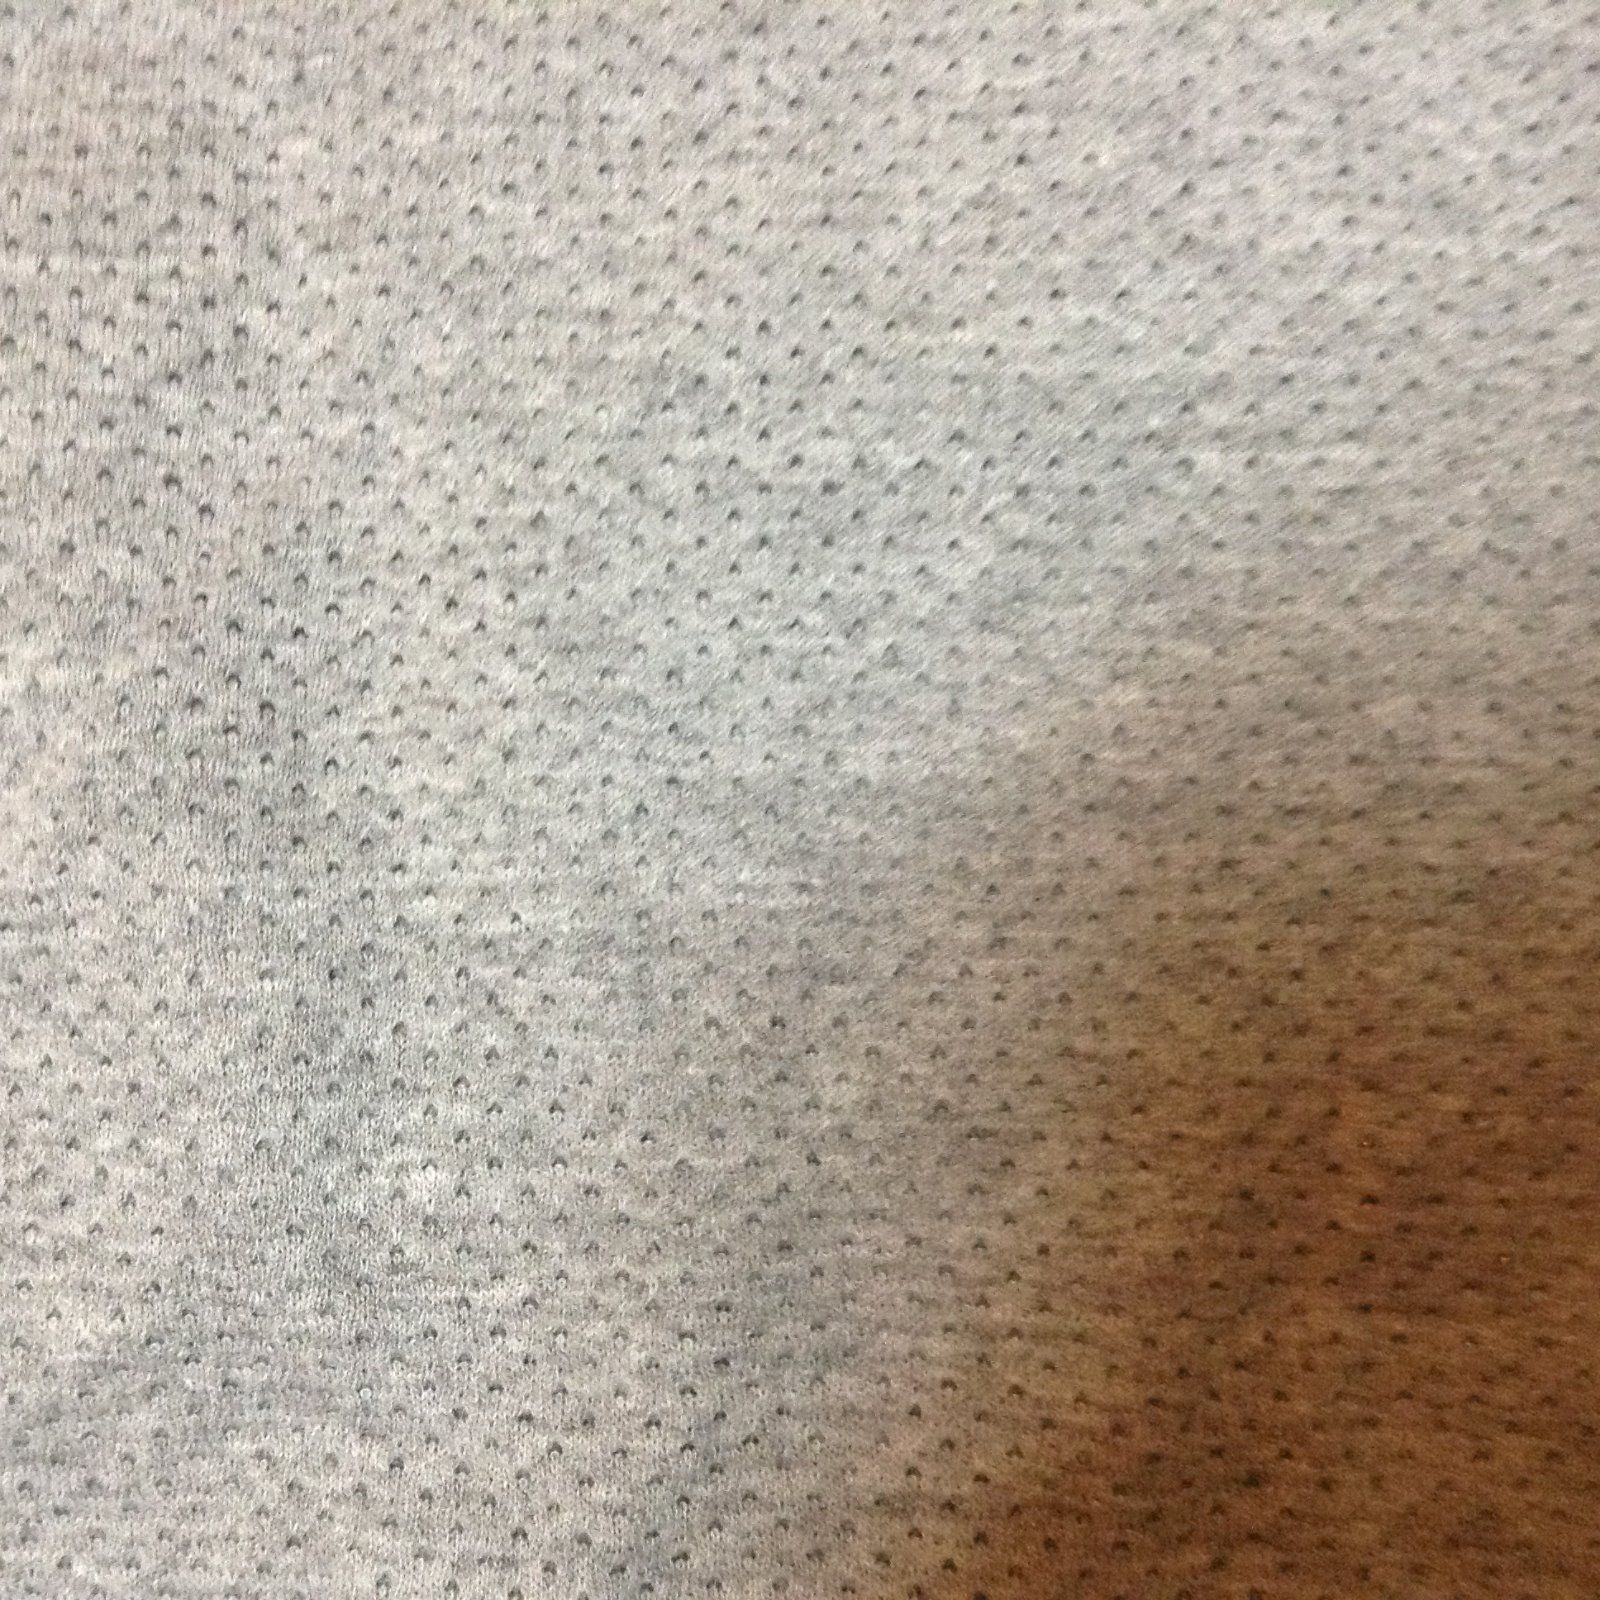 Adams USA Mesh Summer Muscle Shirt Gray NWT  Sz 2XL Adult